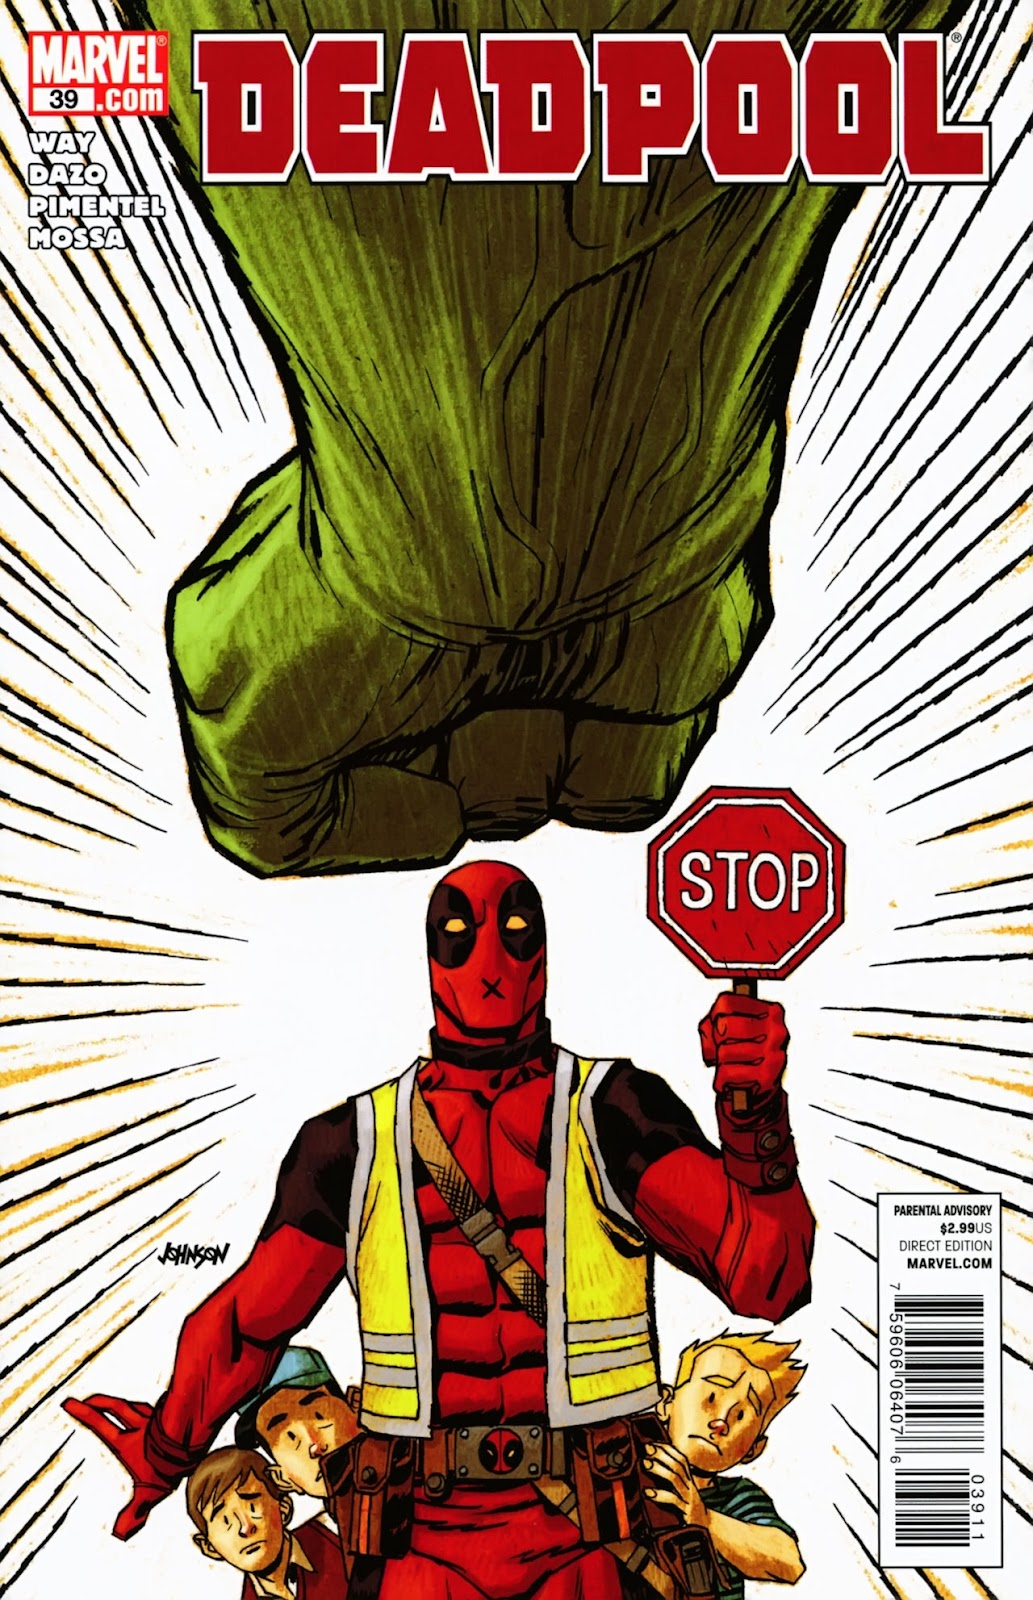 Read online Deadpool (2008) comic -  Issue #39 - 1